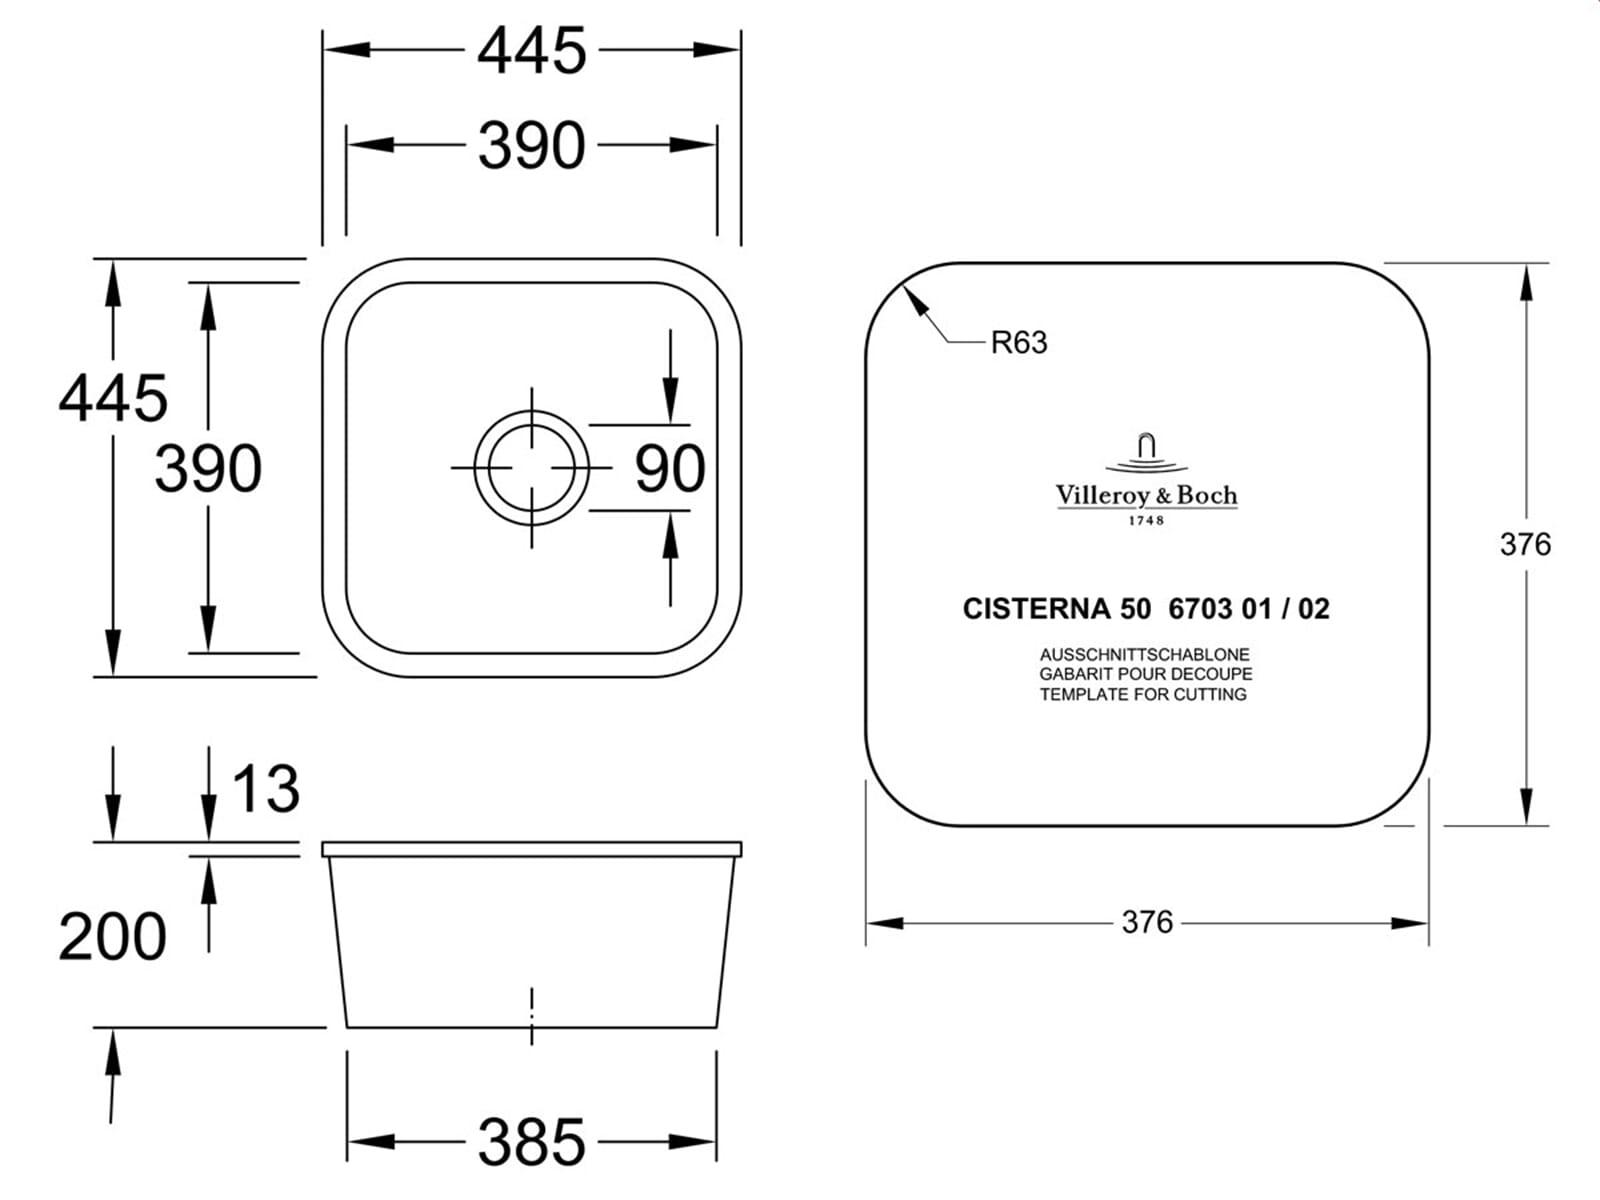 Villeroy & Boch Cisterna 50 Chromit - 6703 02 J0 Keramikspüle Exzenterbetätigung